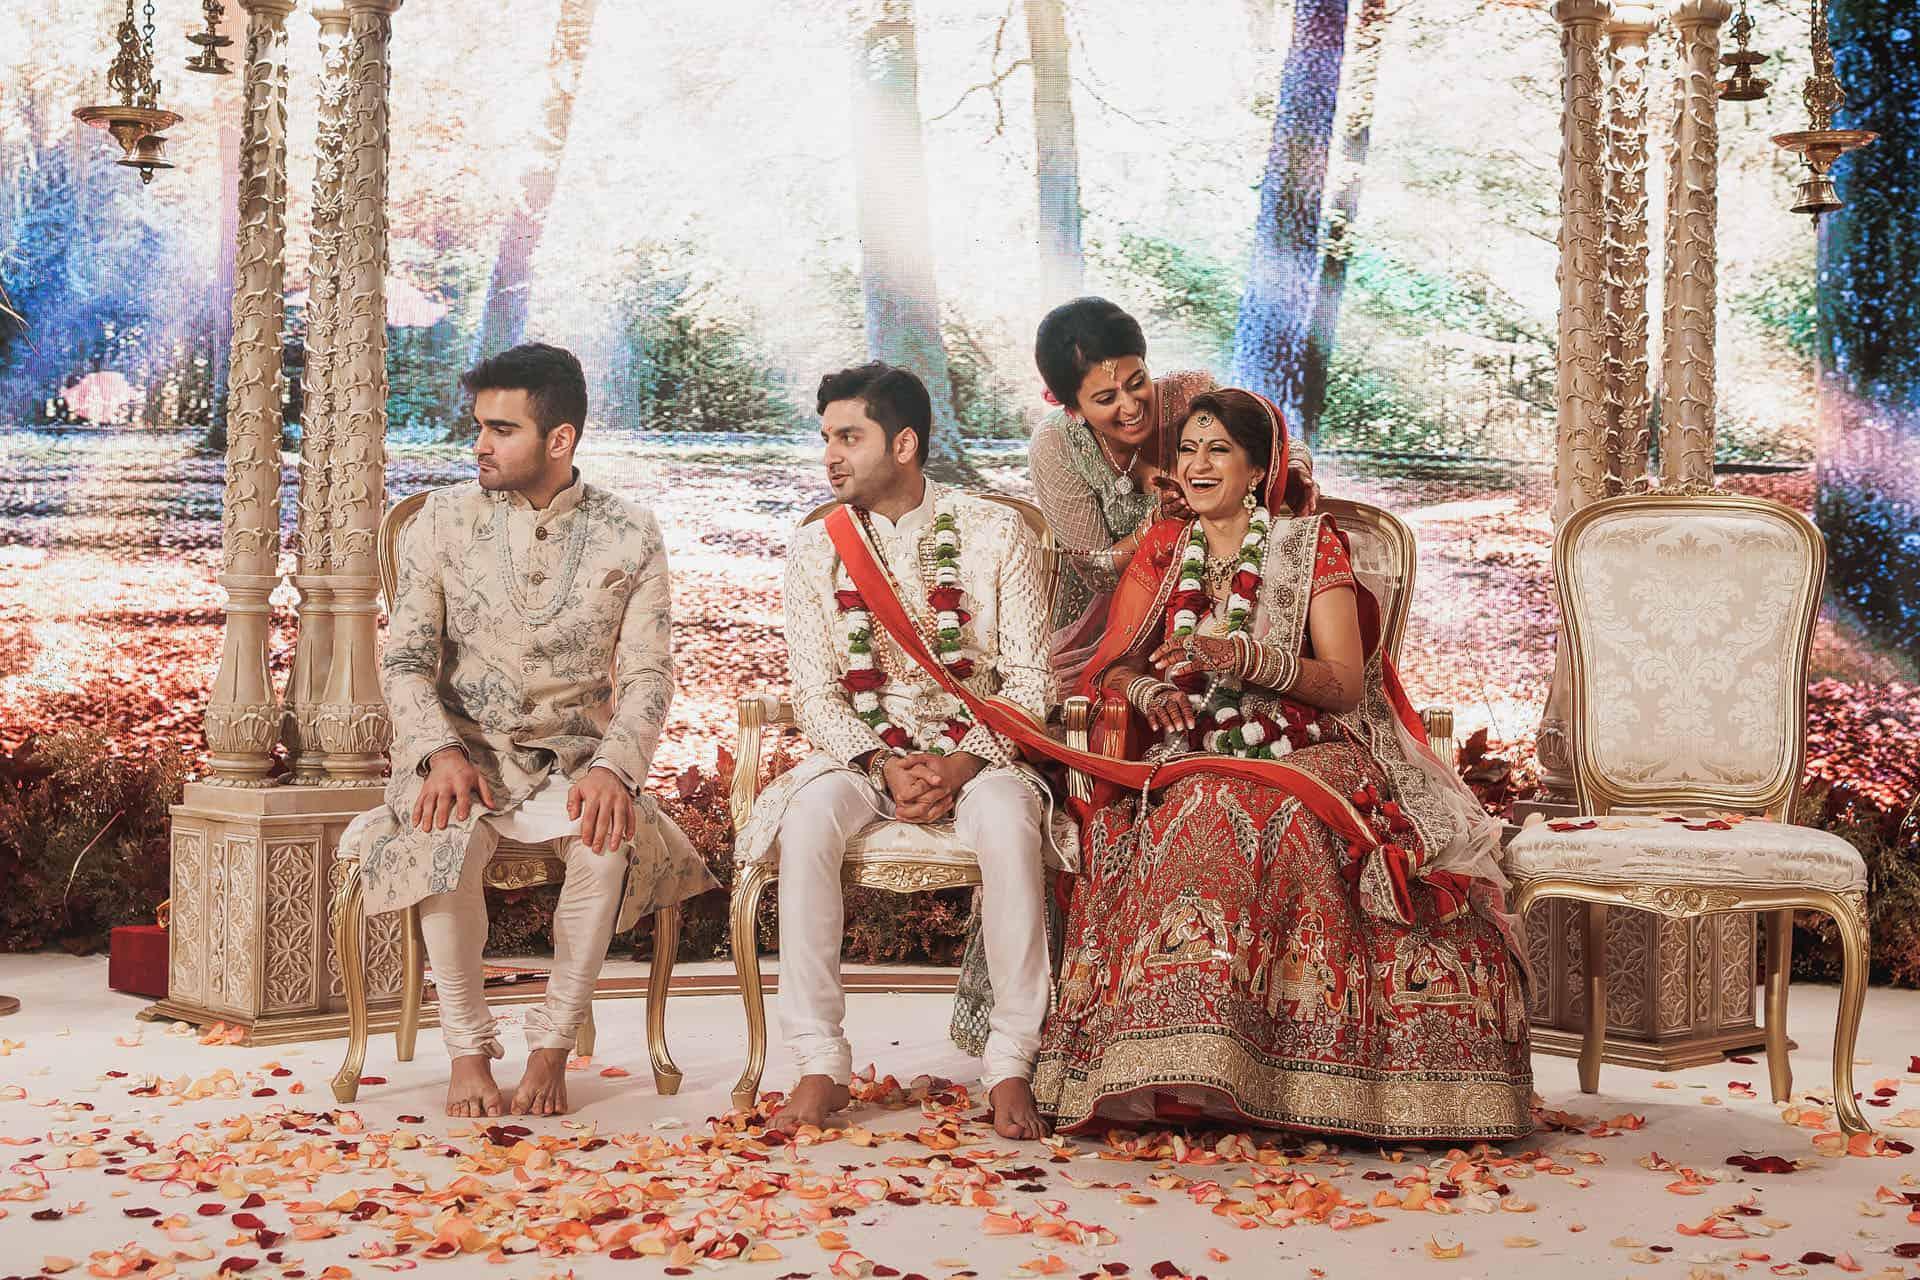 sofitel heathrow hindu wedding photographer